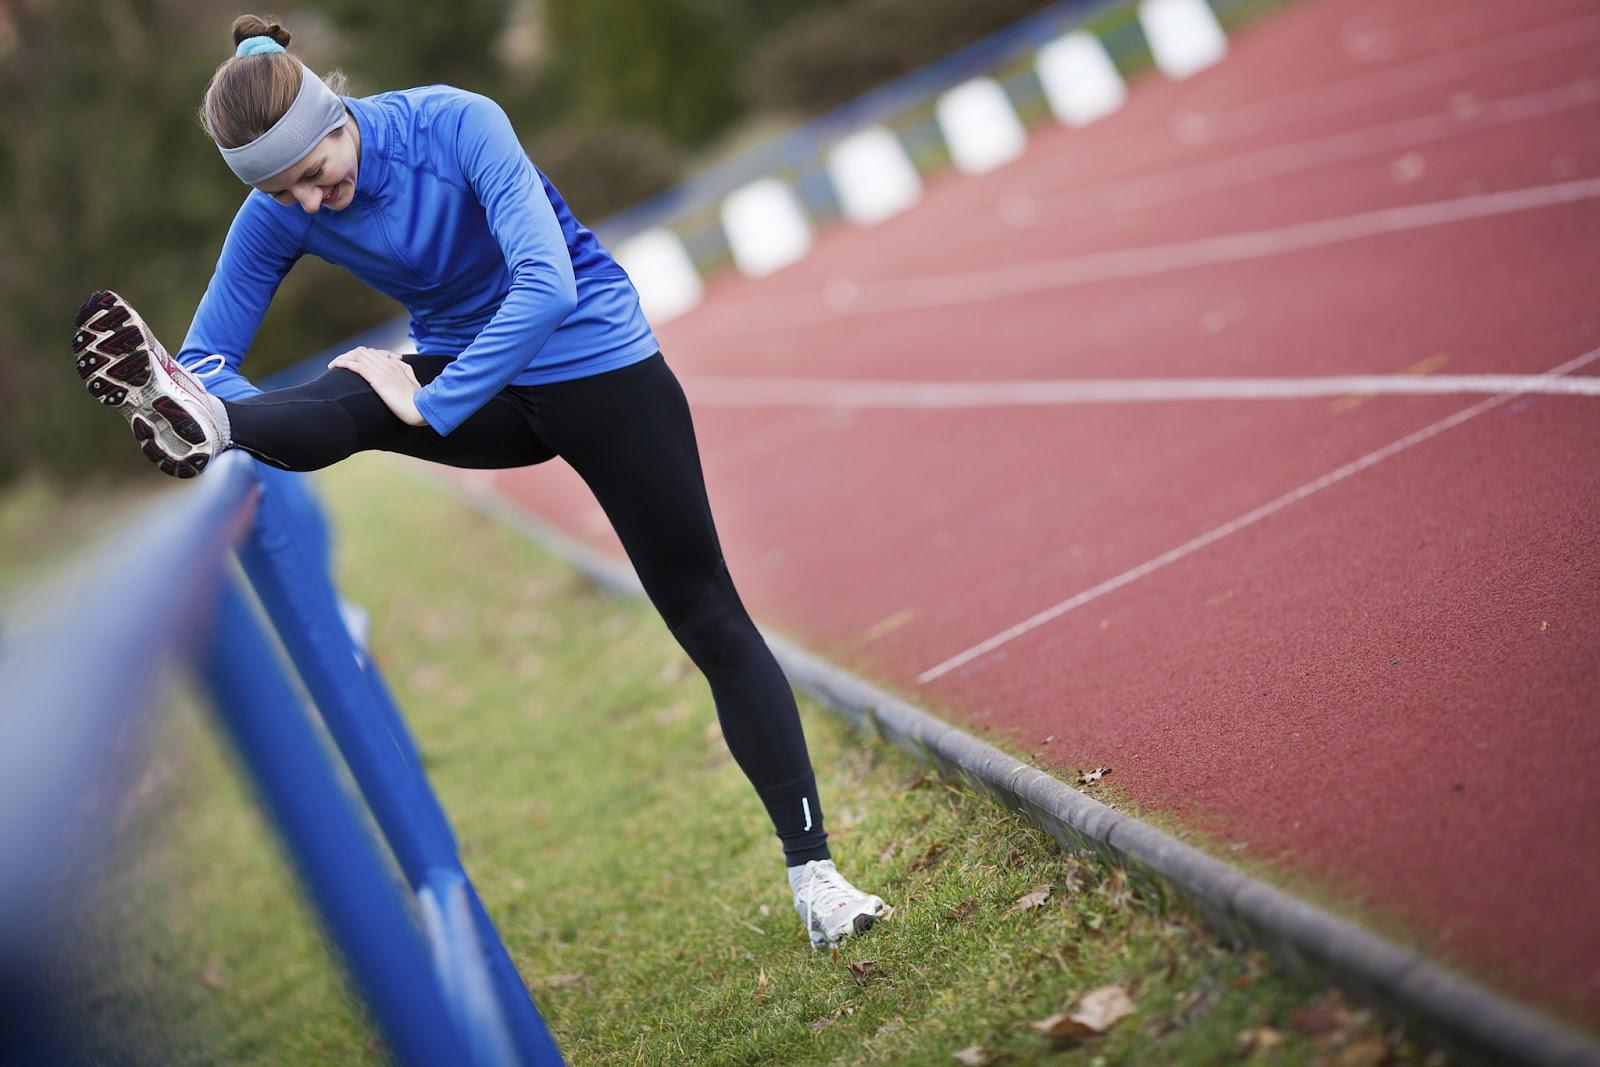 eZxdXum Vv2TwxFB0o TOWFYNC9TStDJMDoV70EUQg0TgcC0eDGudEQd2dYgIob50enEwdpk0TpVxJrXdcGRqIr6jdAYd6cU0chknqu8uYwyektTzLtXh1ut48jDvE1iHoN67BXD - Как избежать травм при занятиях бегом?